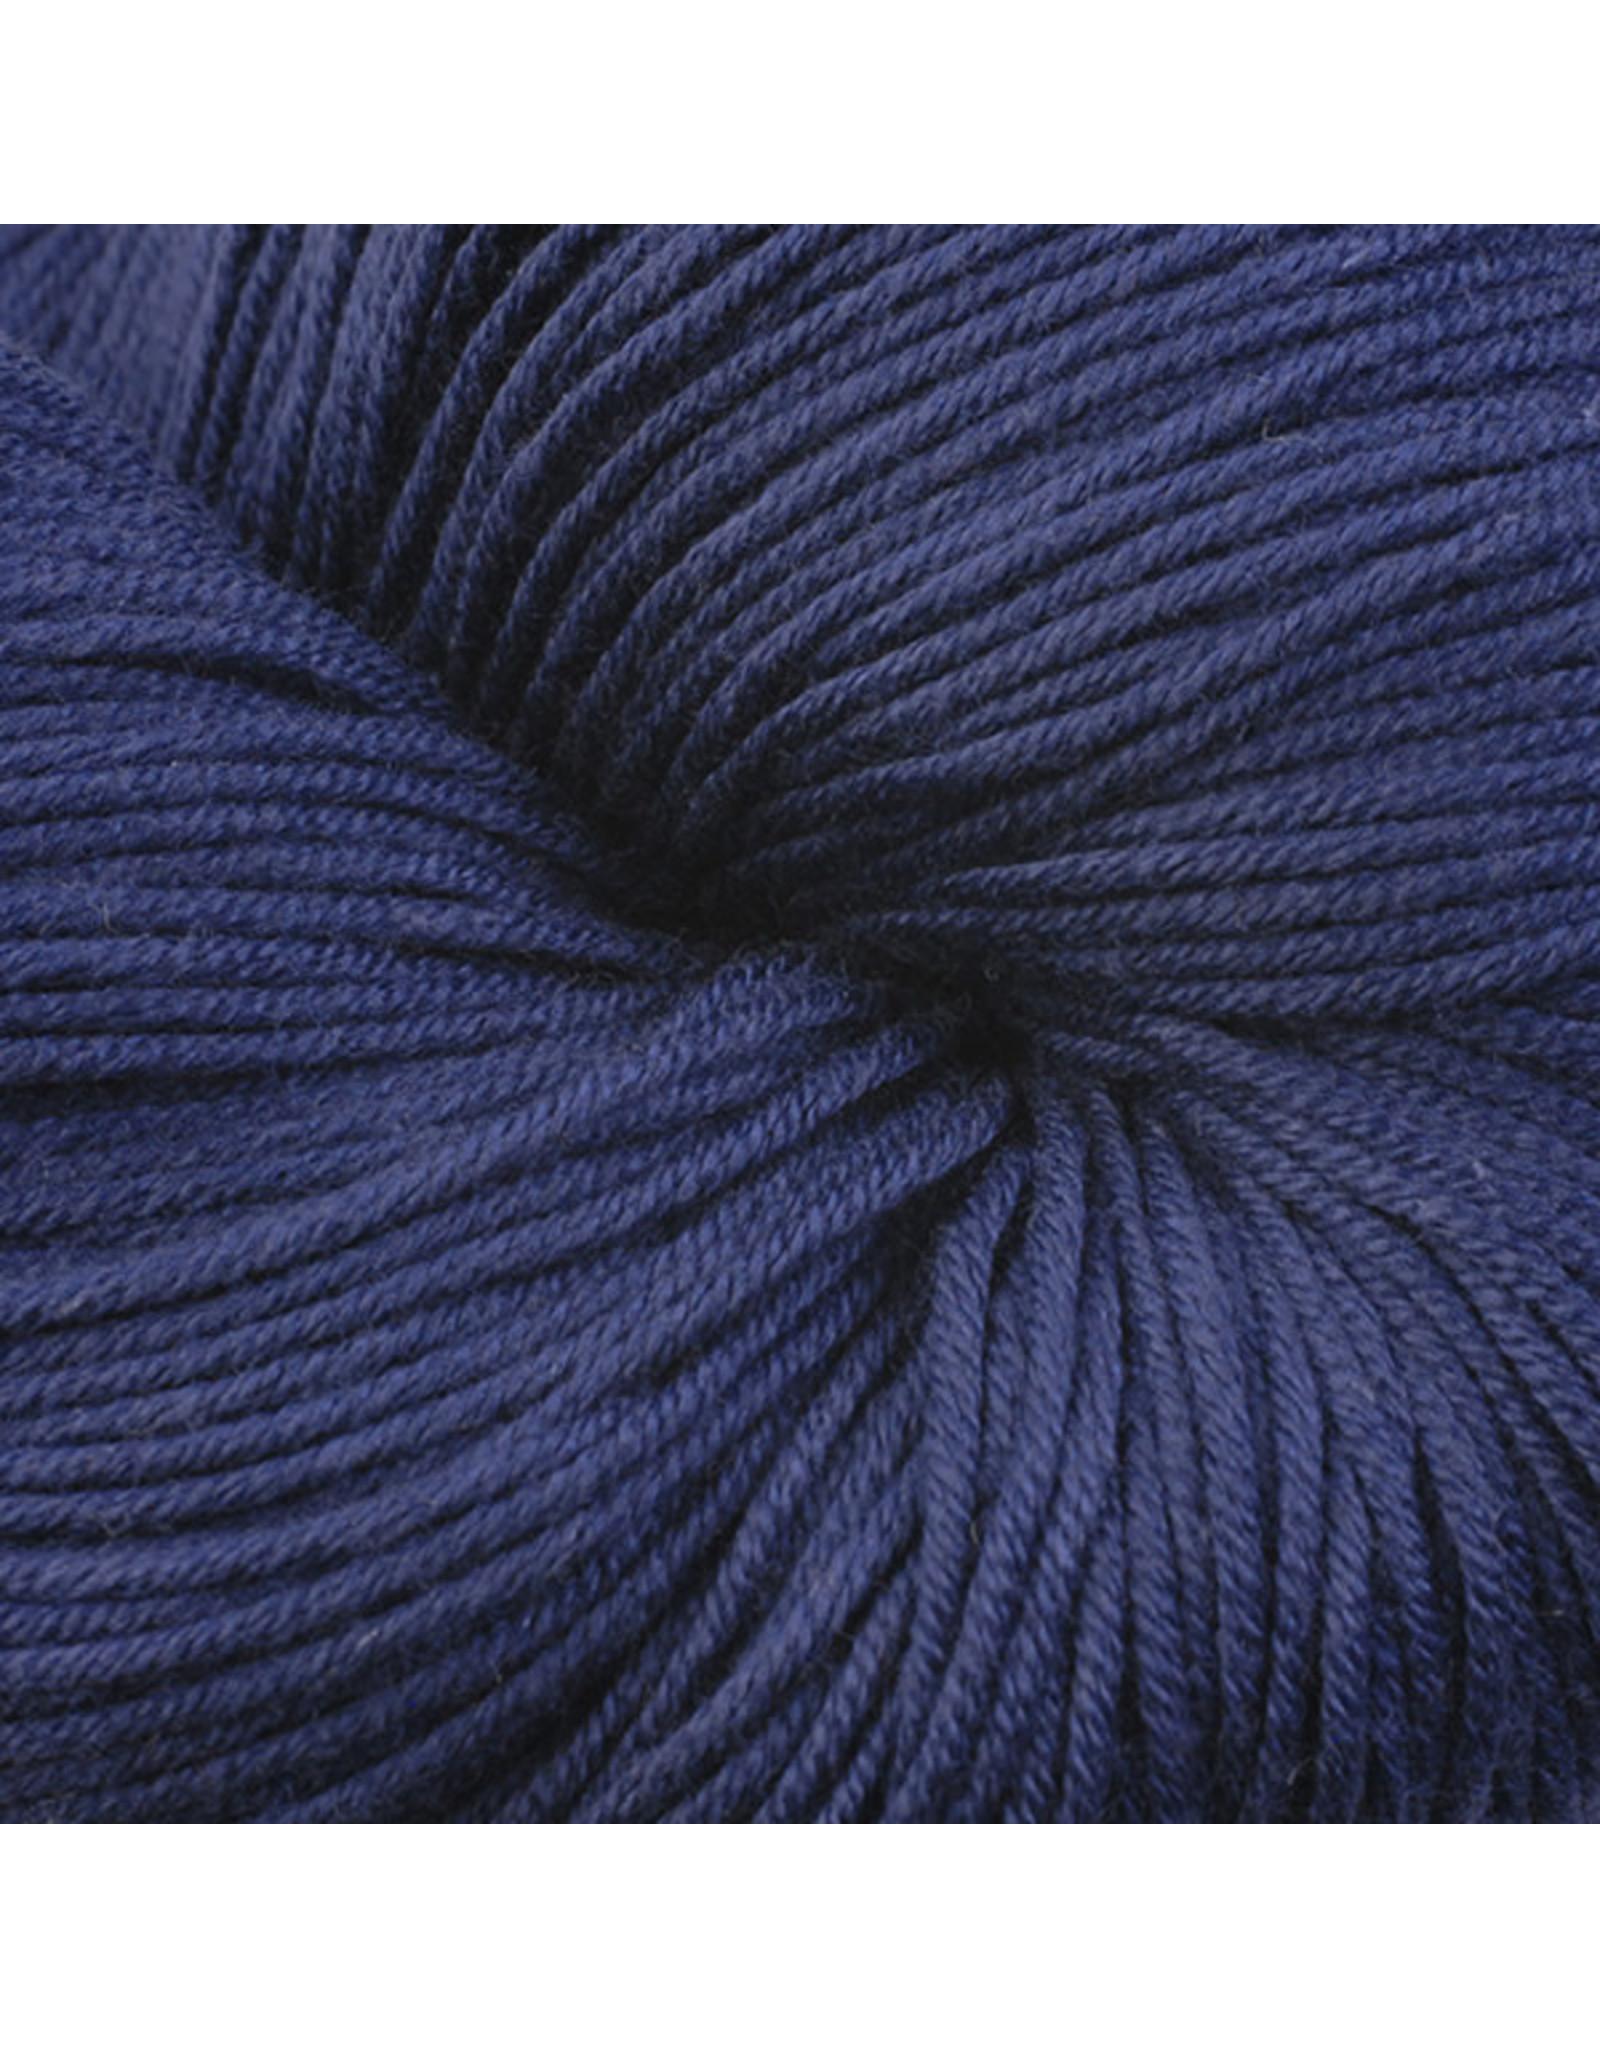 6663 Hope - Modern Cotton DK - Berroco